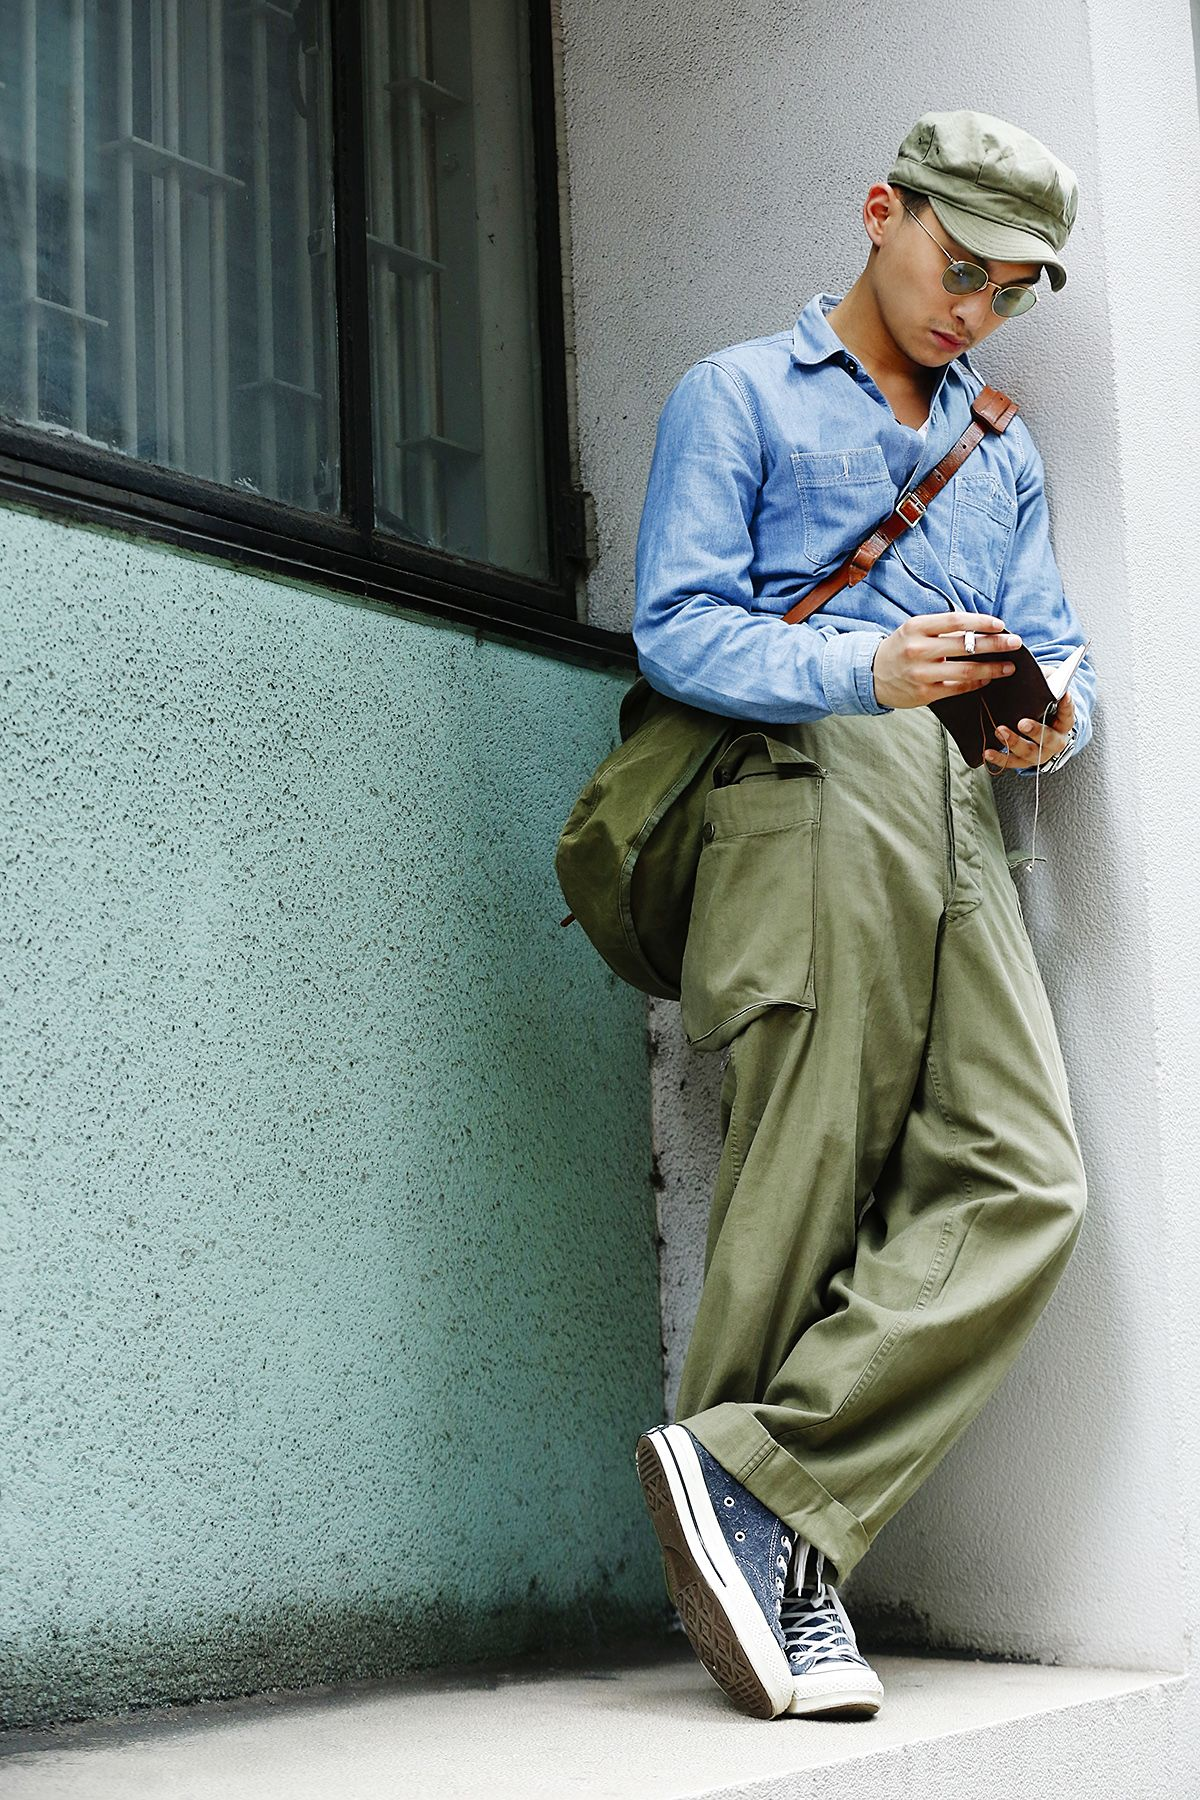 Steezyasiandudes Mens Outfits Army Fashion Mens Street Style